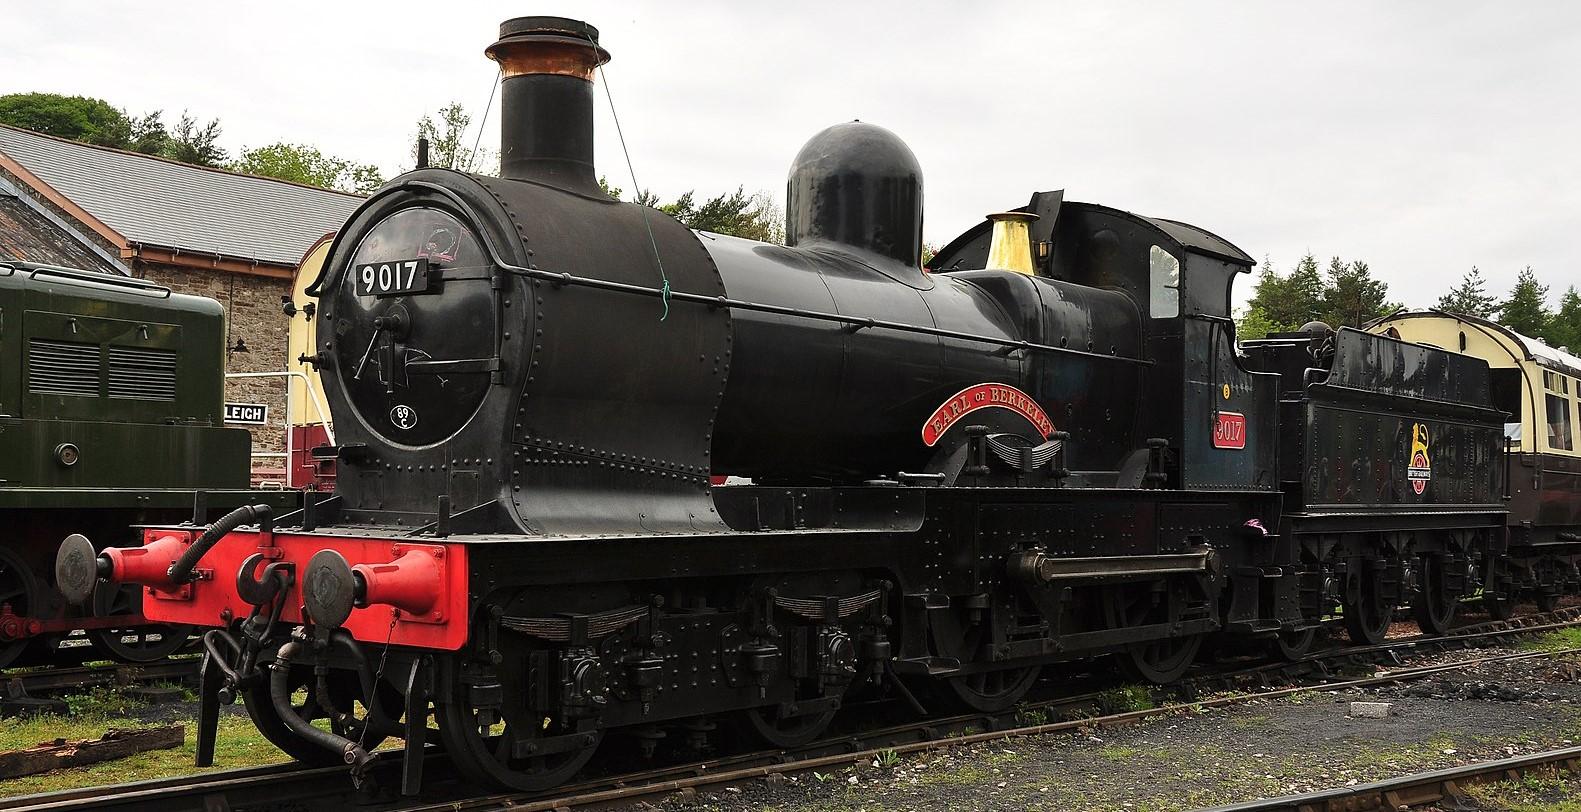 9017 'Earl of Berkeley' at Buckfastleigh on the South Devon Railway in May 2011. ©Nilfanion